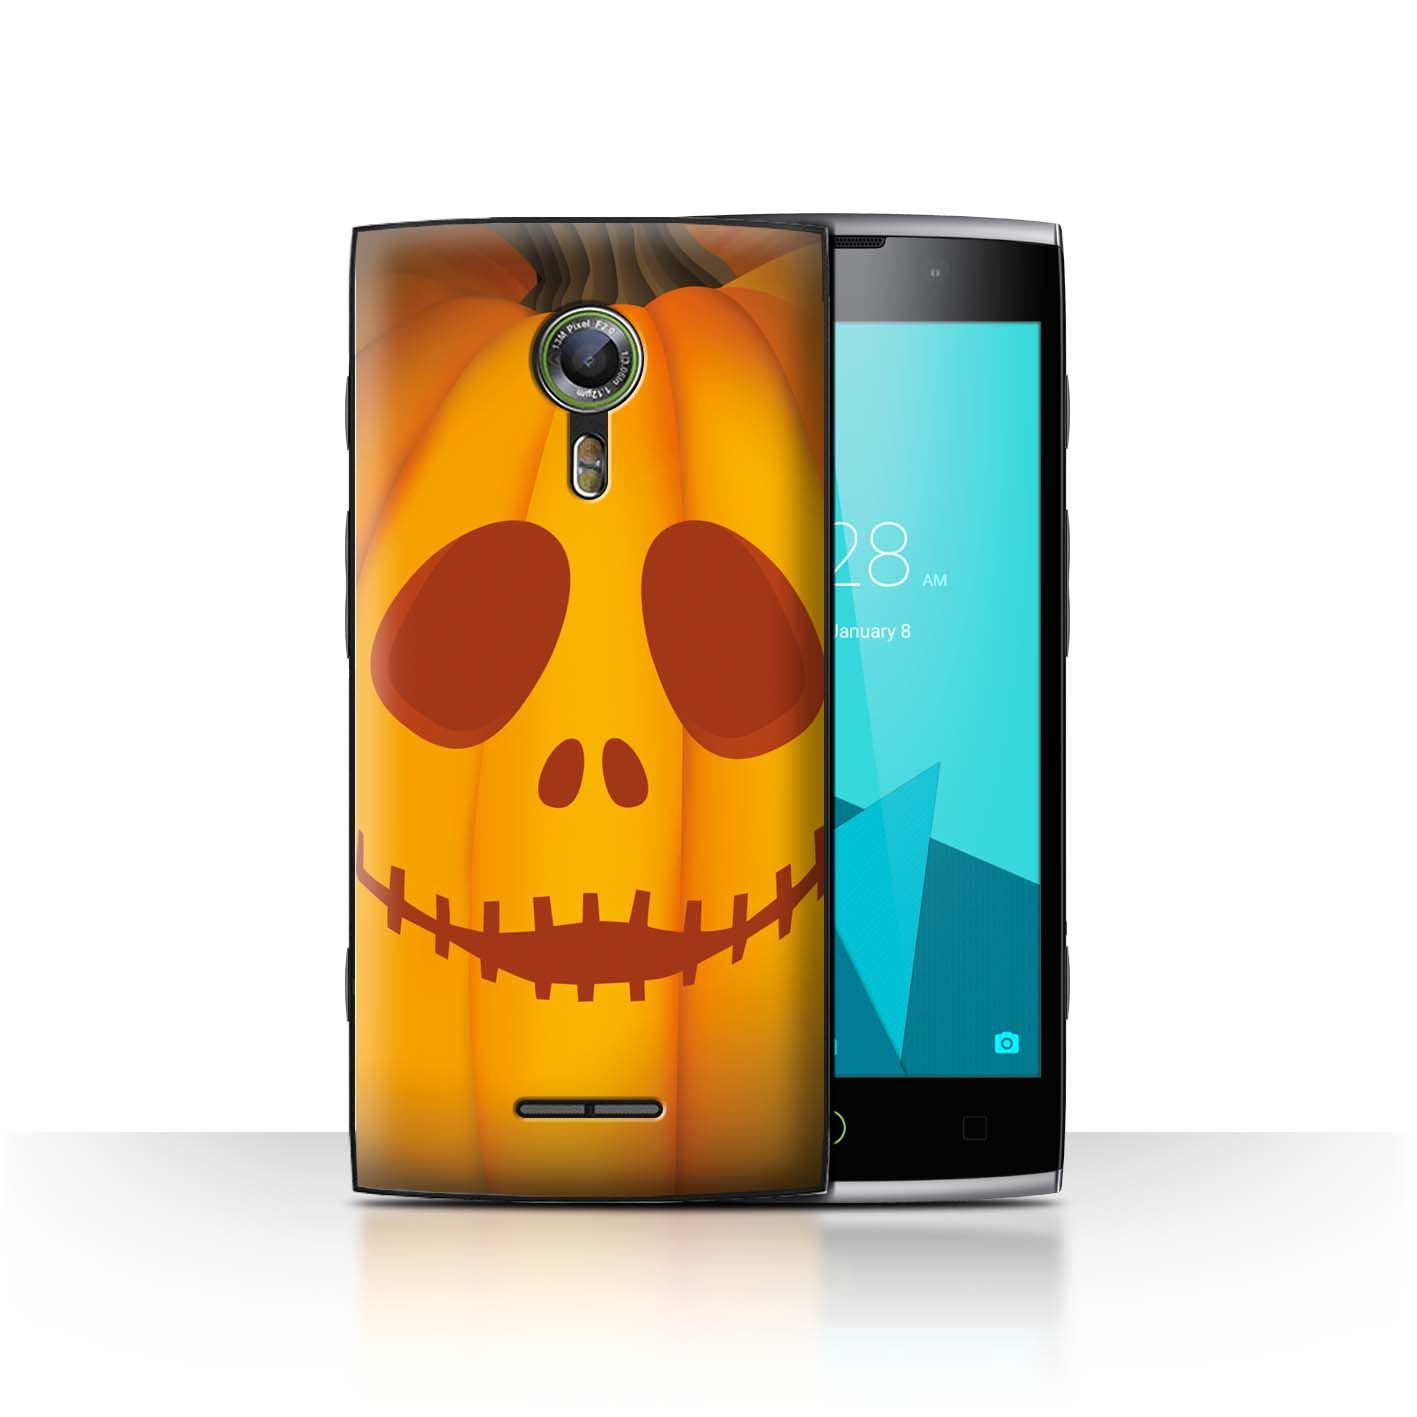 STUFF4-Back-Case-Cover-Skin-for-Alcatel-Flash-2-Halloween-Pumpkin